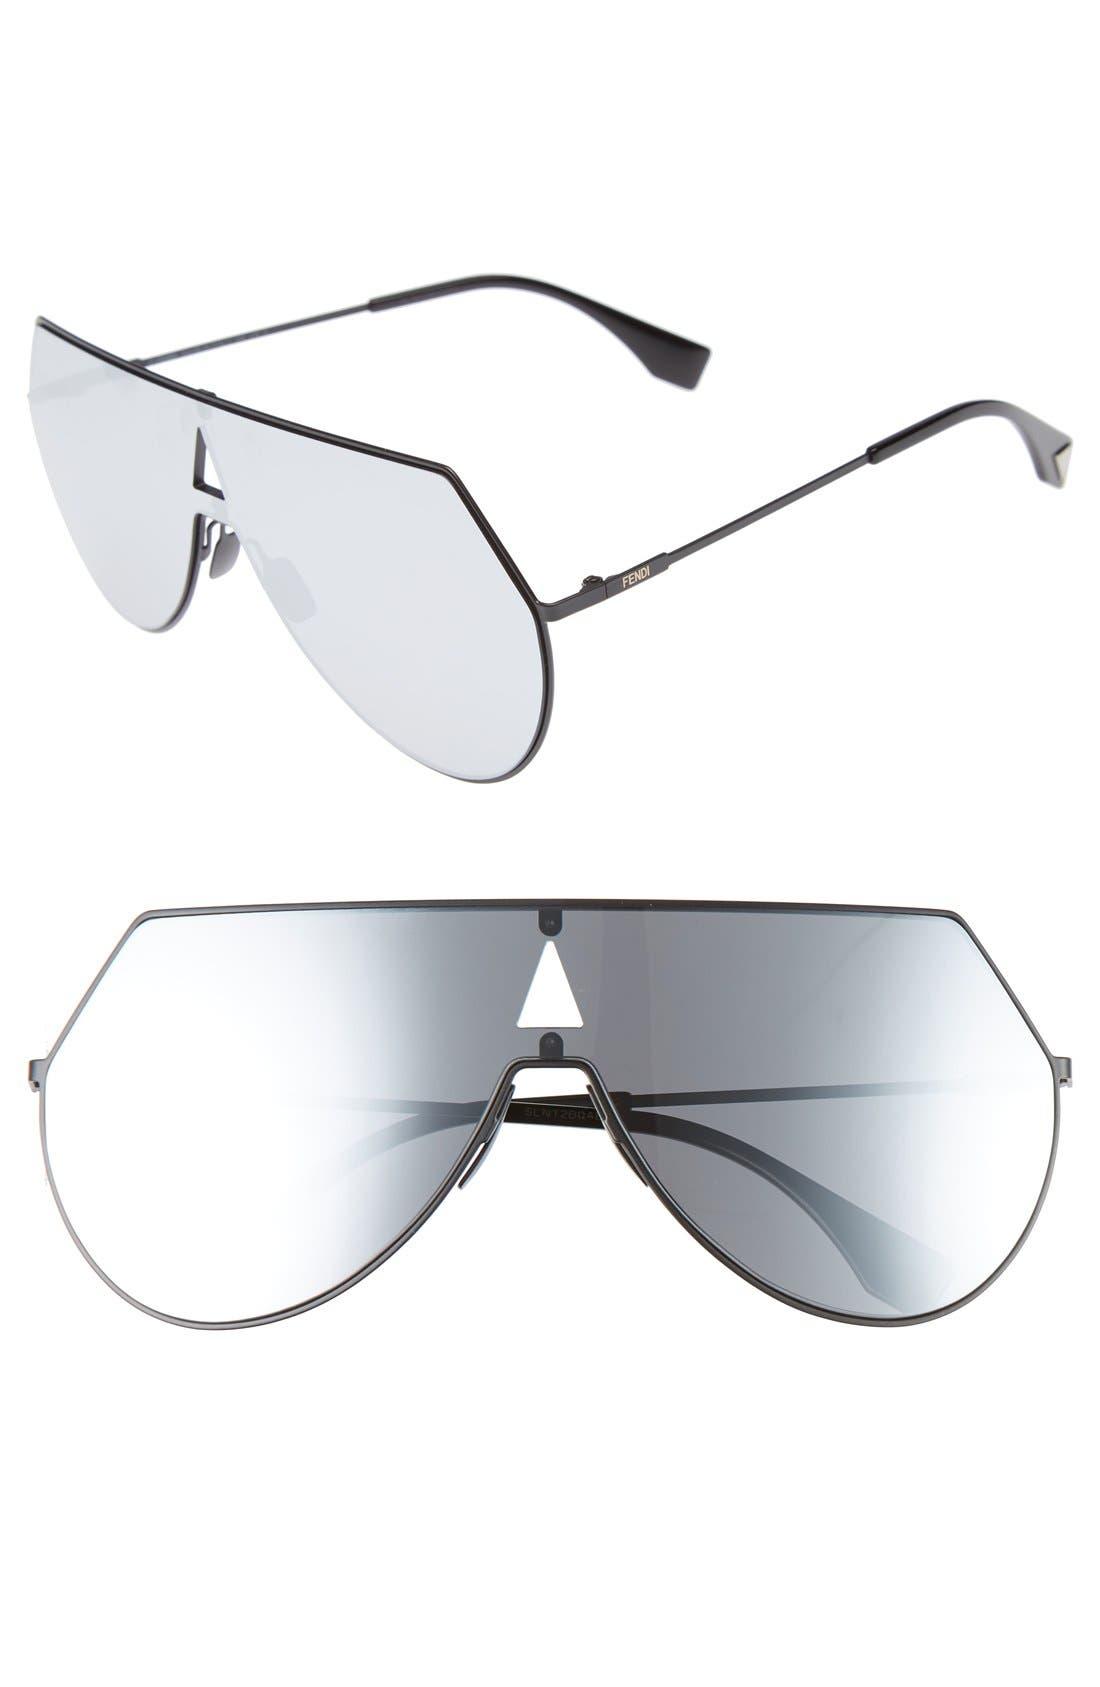 Main Image - Fendi 99mm Eyeline Aviator Sunglasses